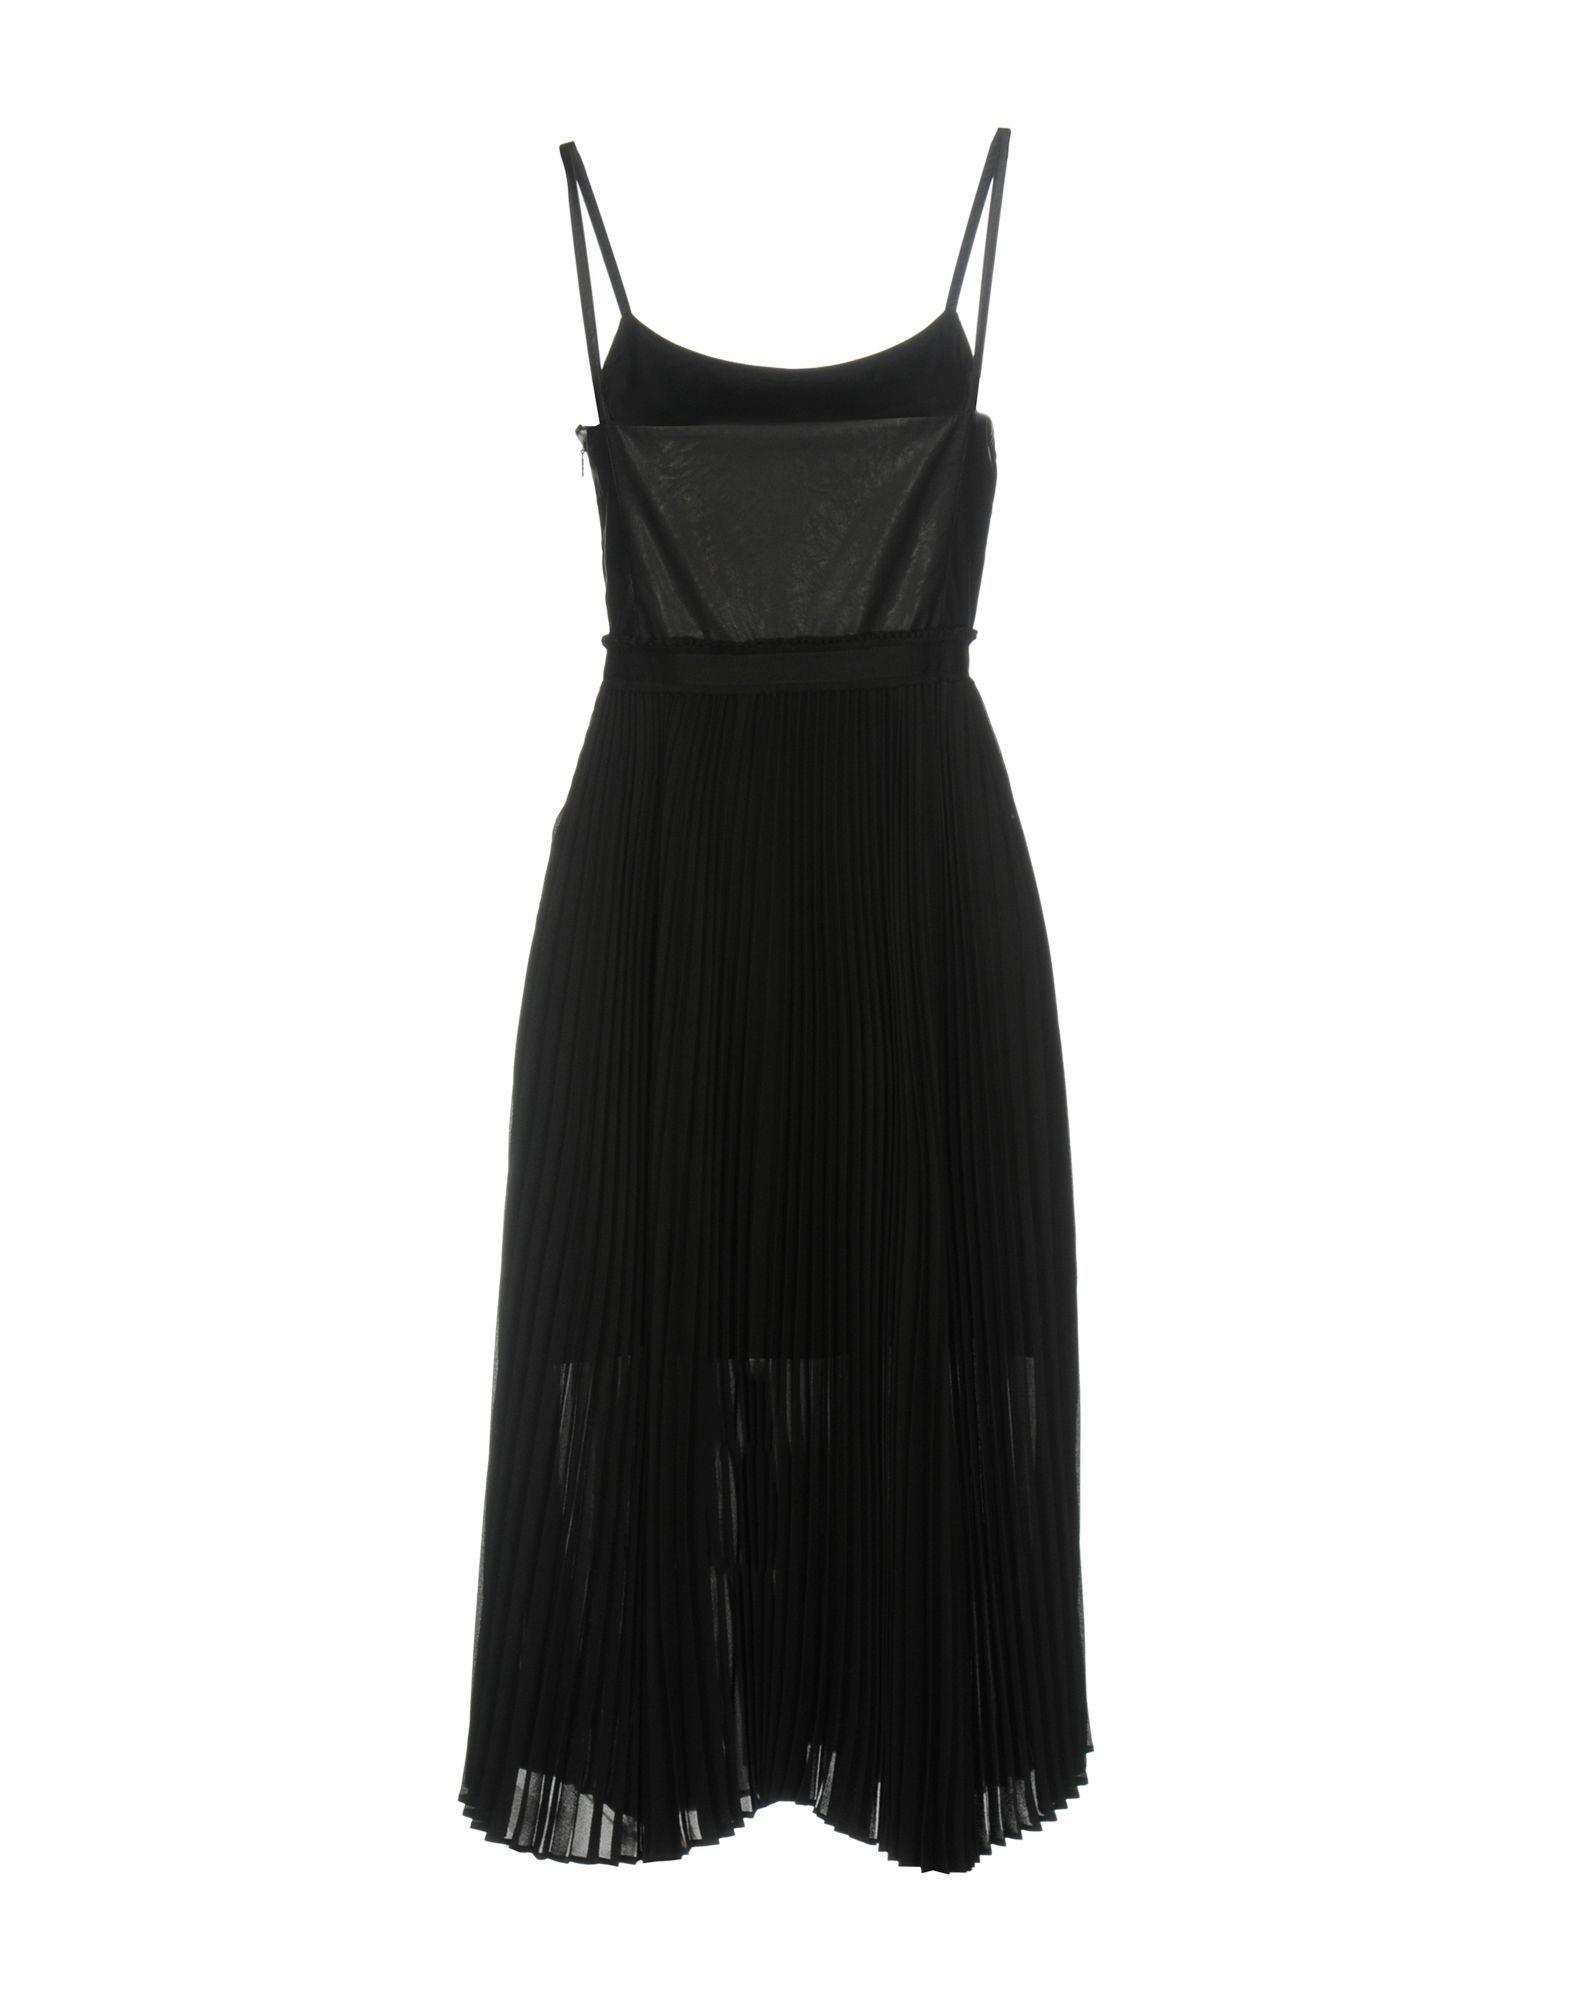 Pinko Black Camisole Dress